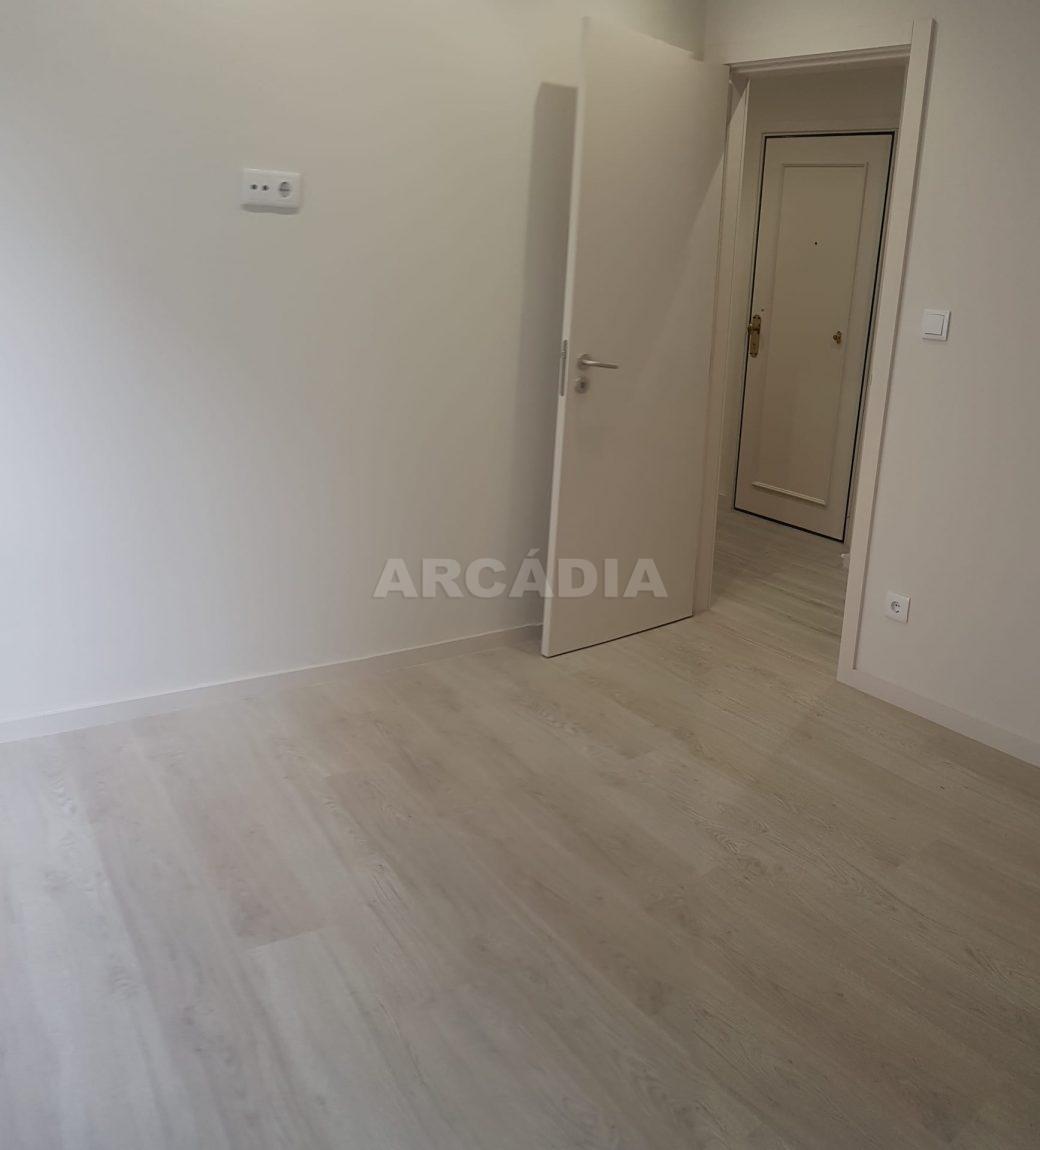 arcadia-imobiliaria-braga-apartamento-tipo-3-arrendamento-sao-lazaro-remodelado-excelente-preco-unica-oportunidade23